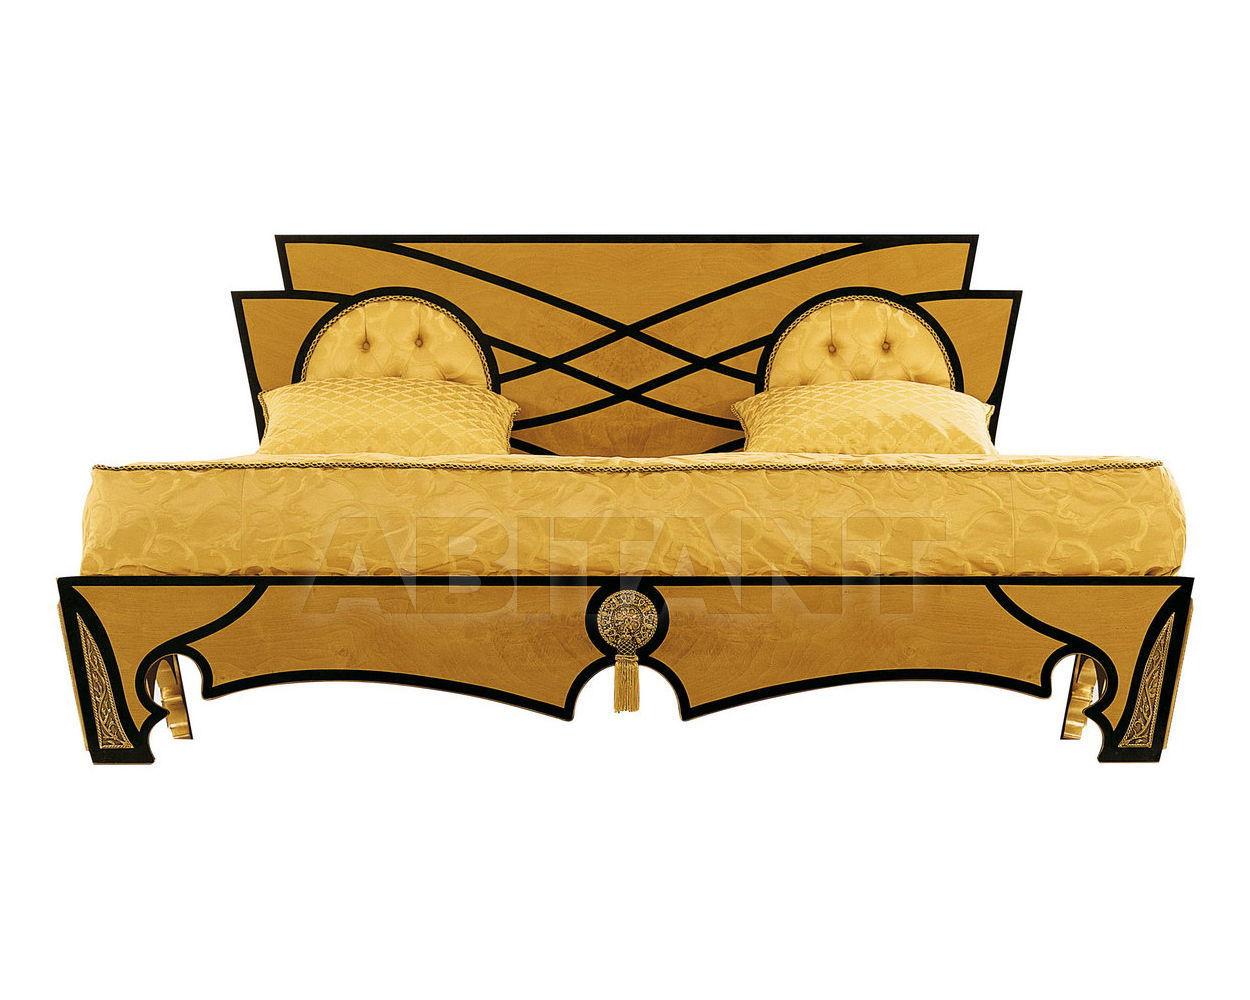 Купить Кровать Colombostile s.p.a. Xxi Secolo Un Mondo Aperto/dietro La Grande Muraglia 0330 LM